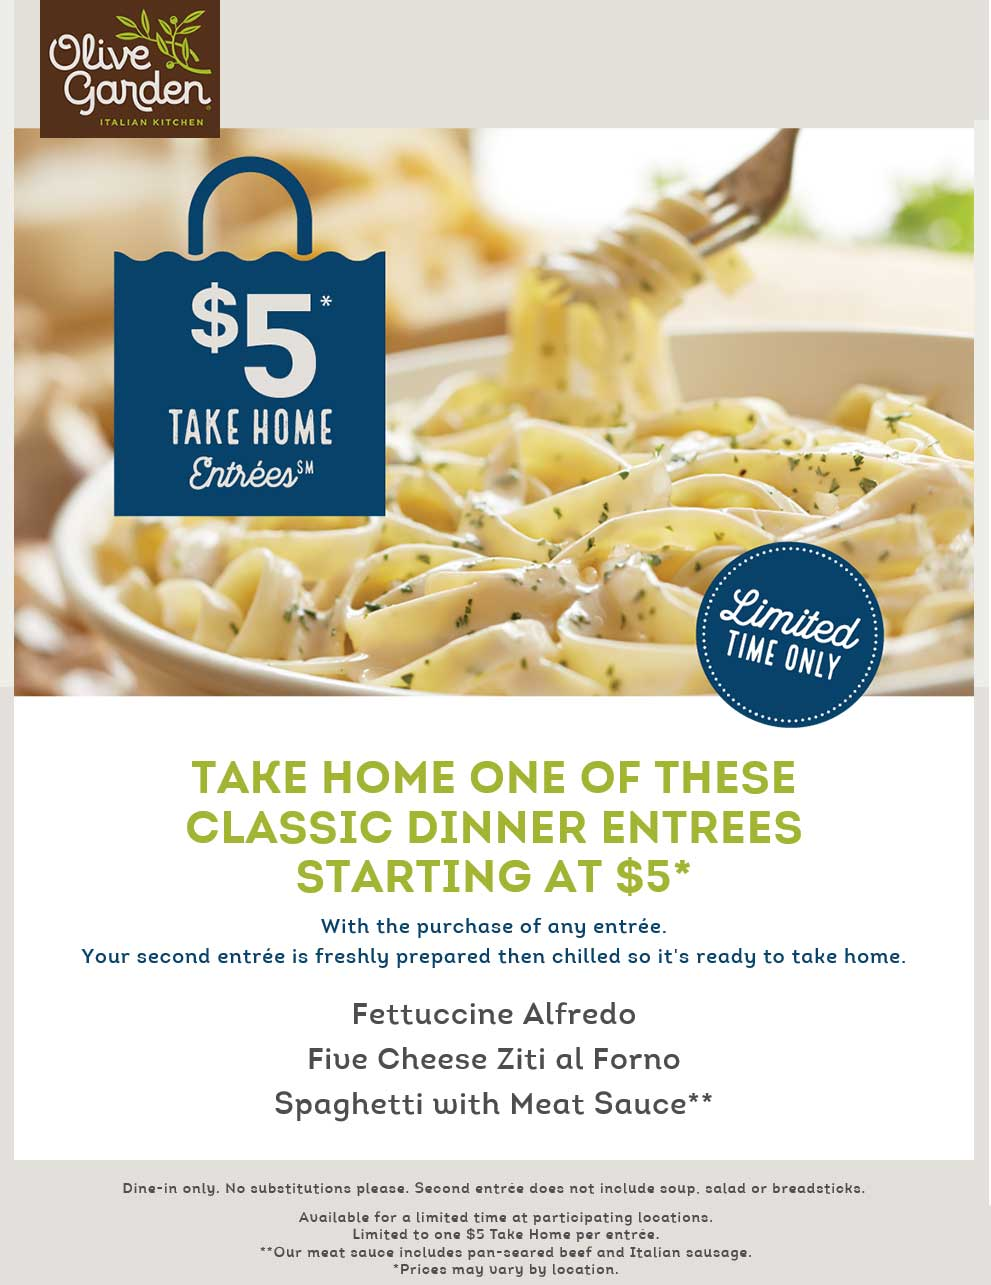 Olive Garden Coupon October 2018 $5 take home entrees at Olive Garden